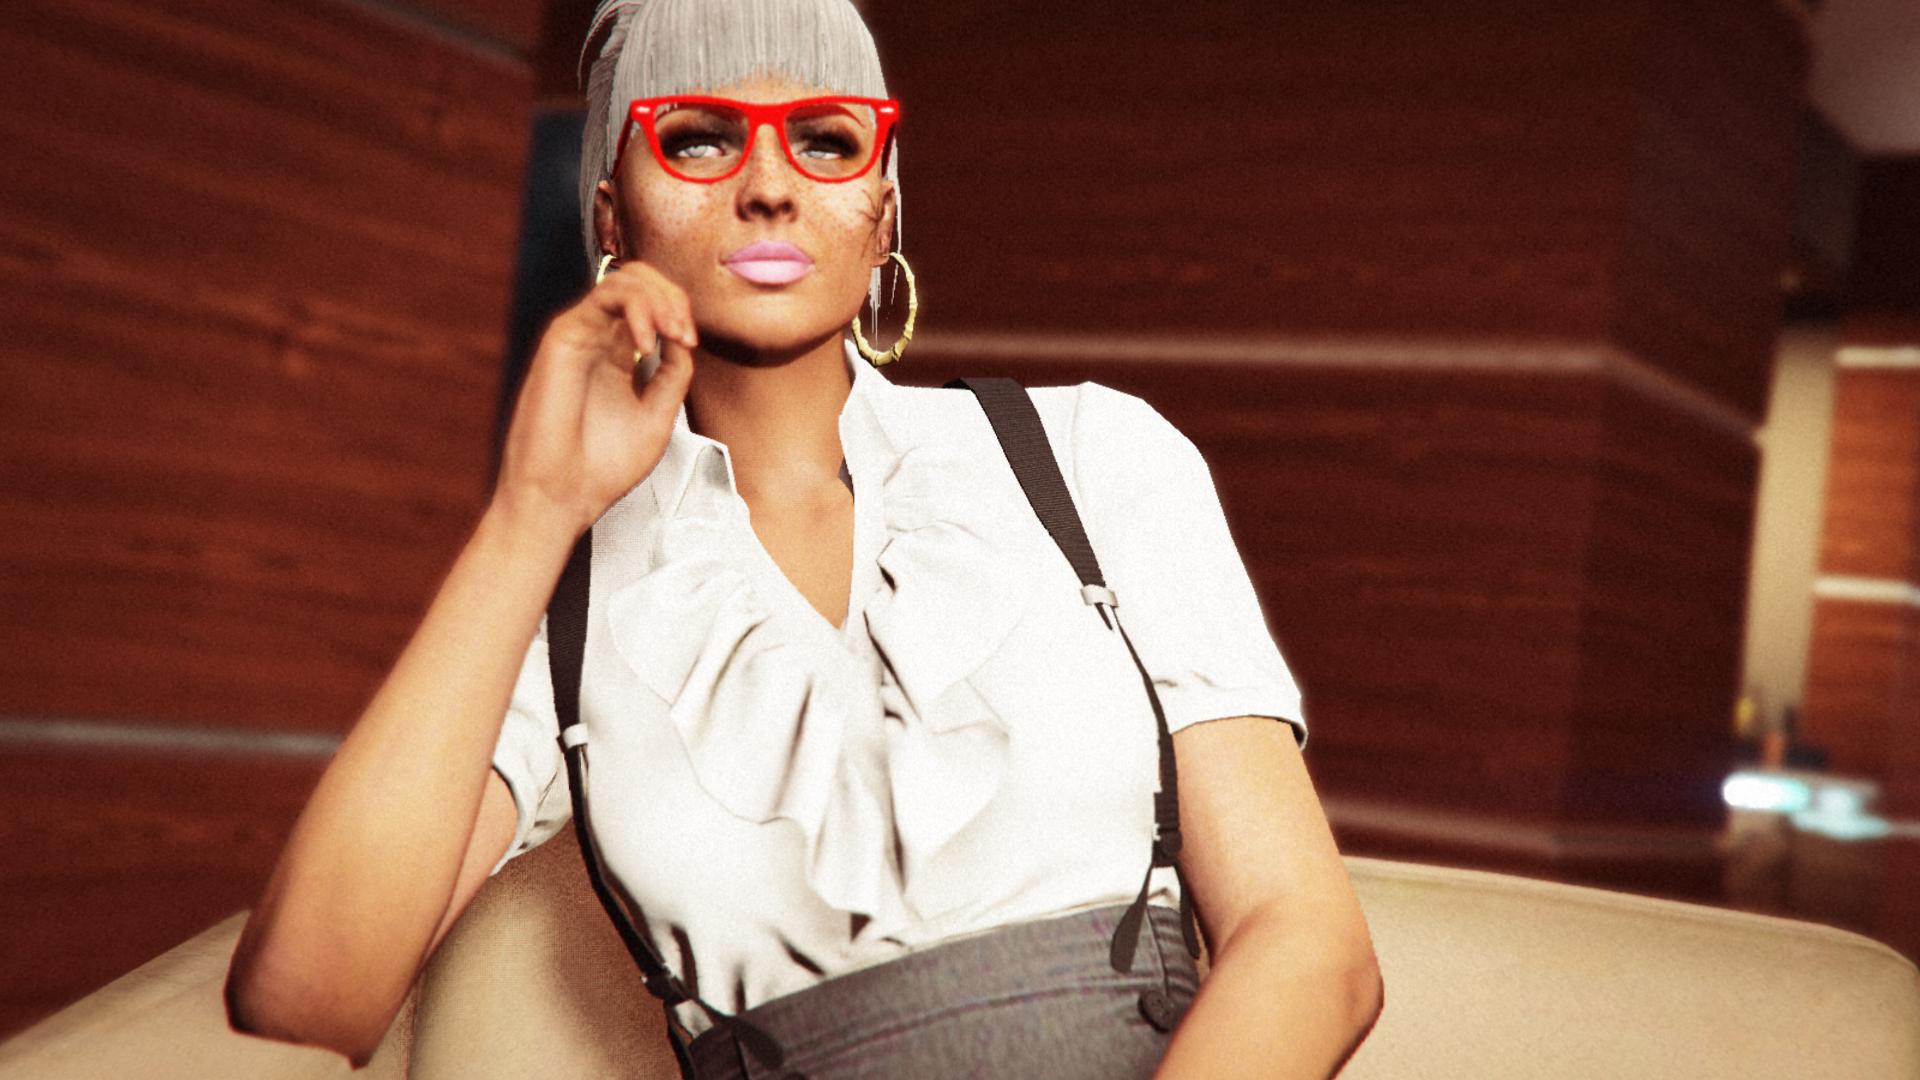 6635ba98cf6 model glasses makeup singer office fashion Grand Theft Auto V Grand Theft  Auto Online Rockstar Games